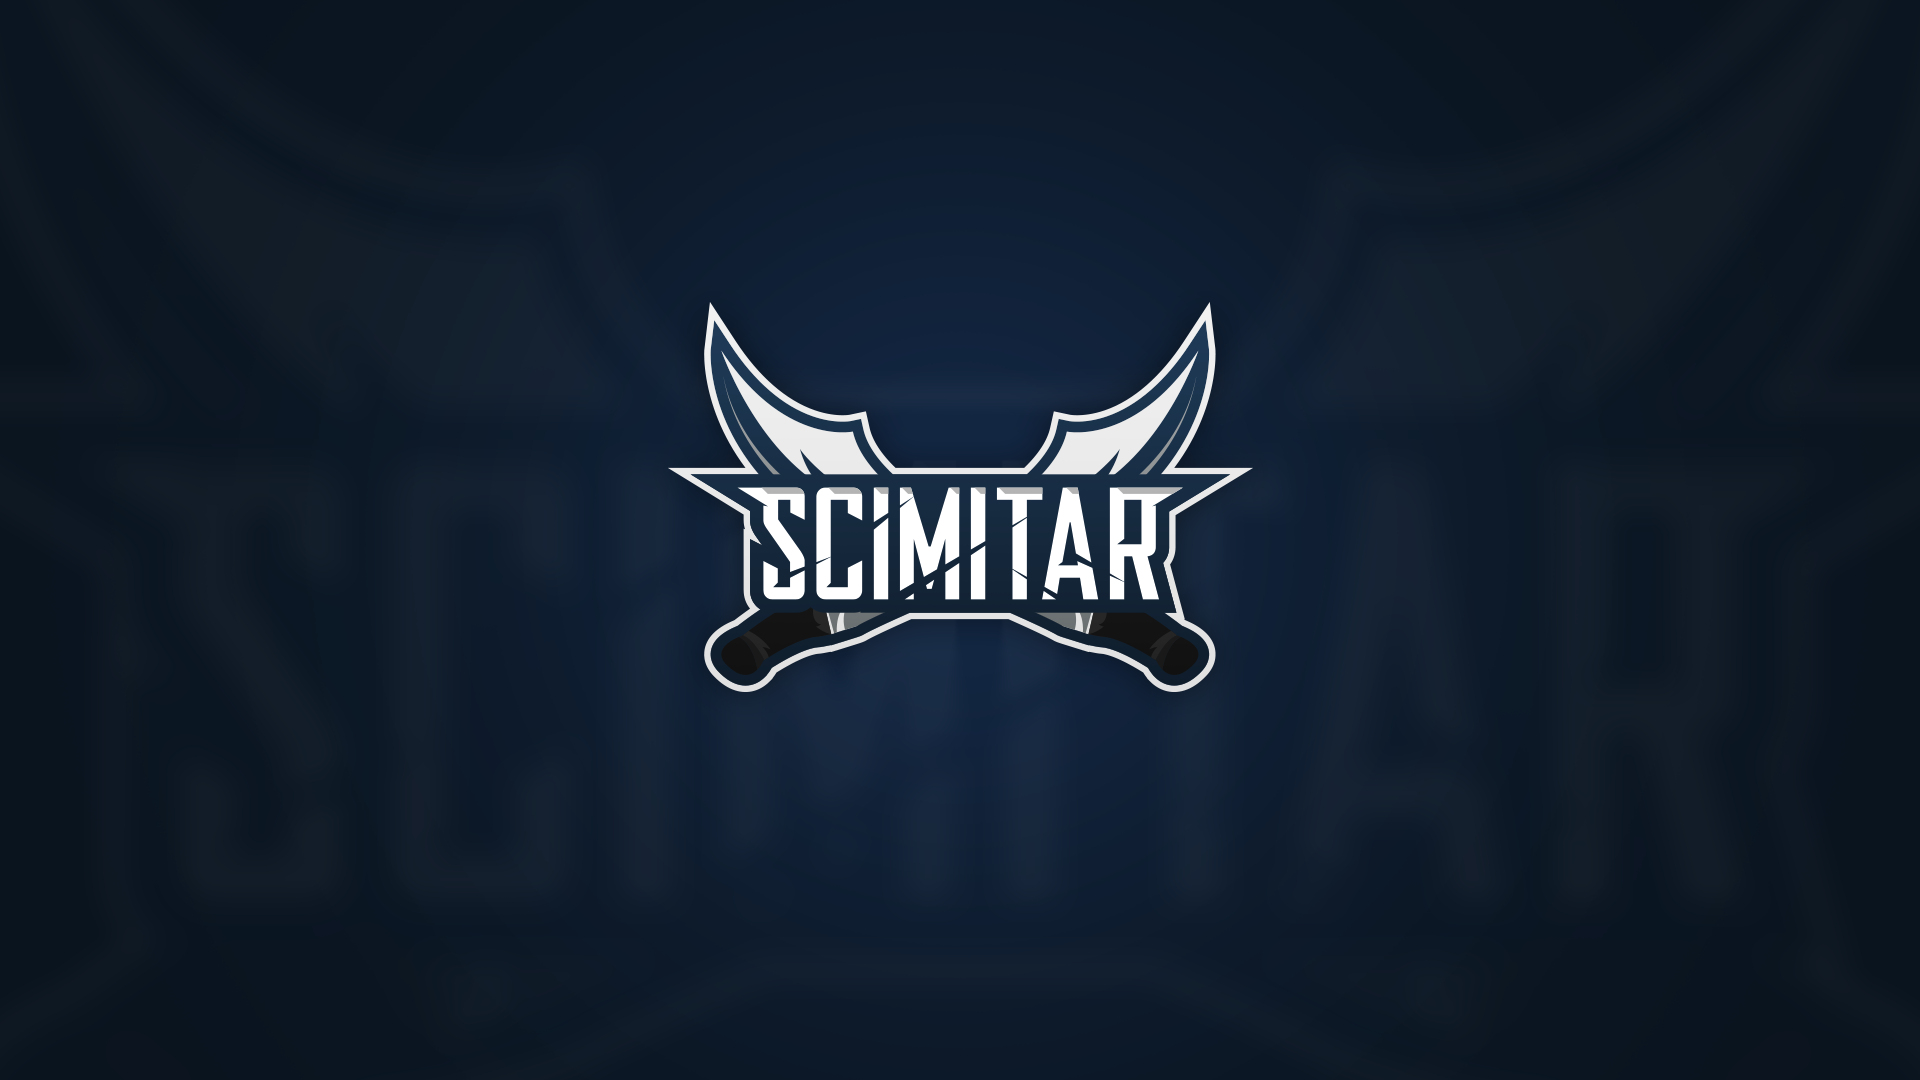 Scimitar Pc